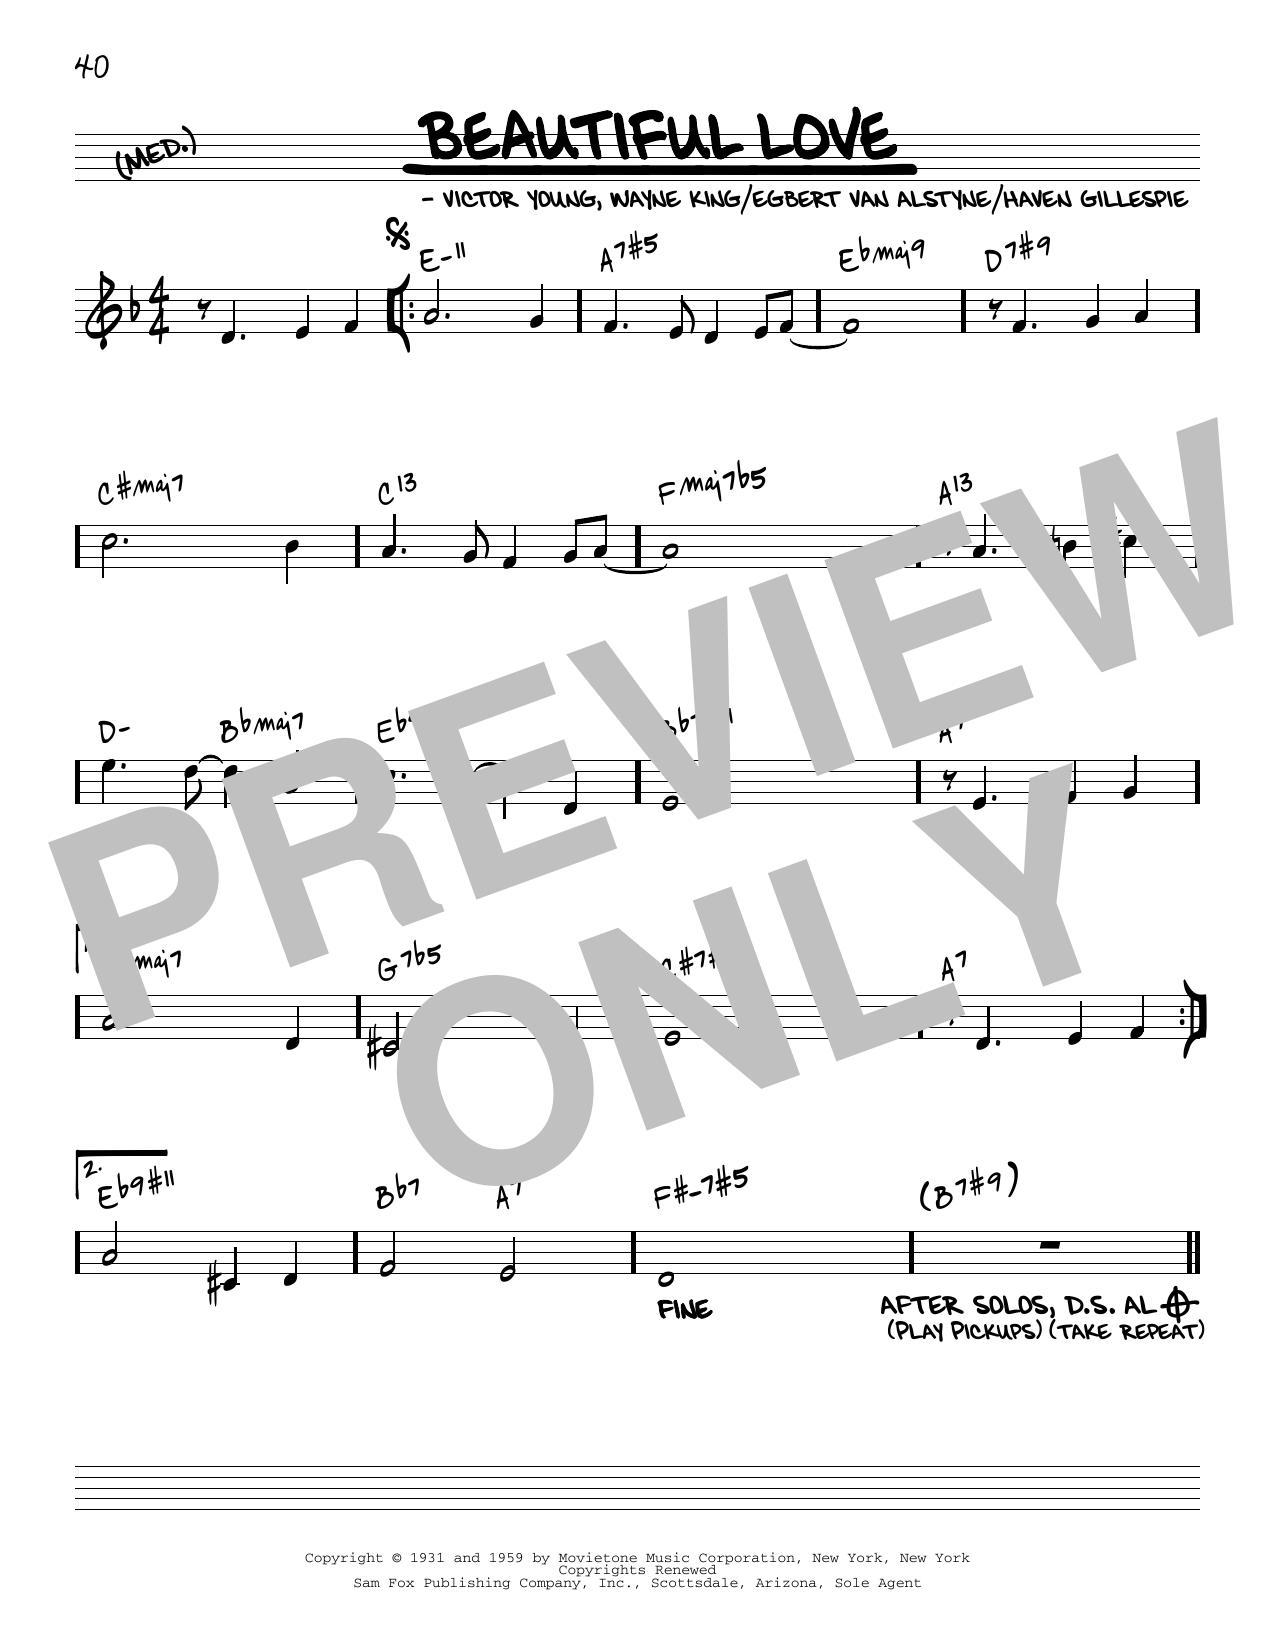 Bill Evans Beautiful Love [Reharmonized version] (arr. Jack Grassel) sheet music notes printable PDF score